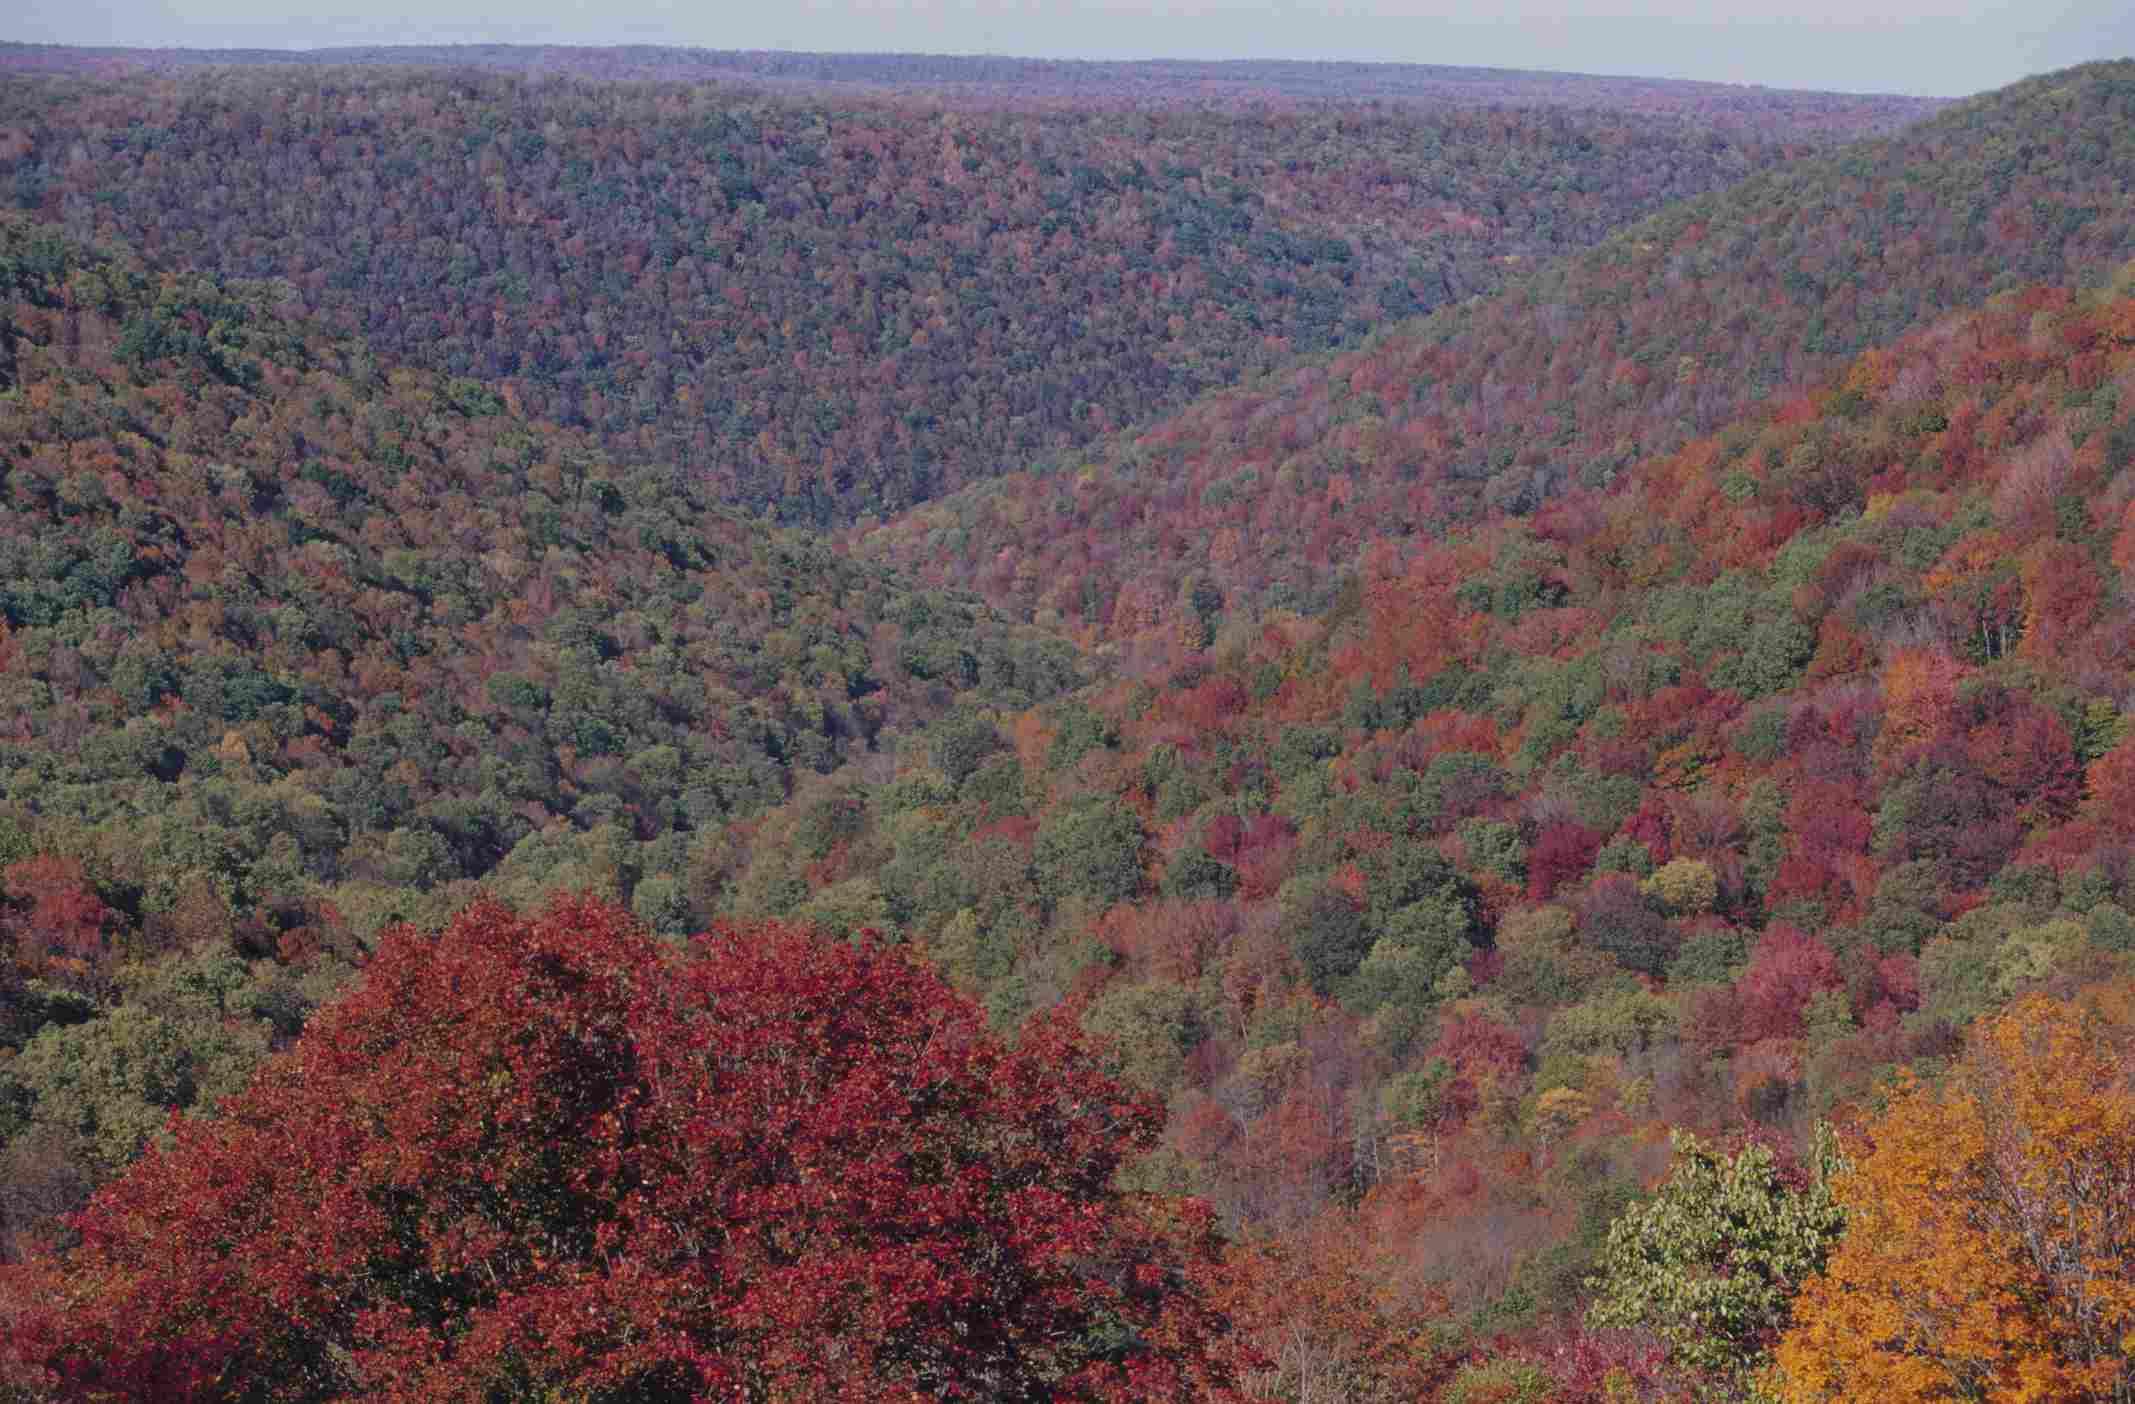 Allegheny Mountains in Autumn